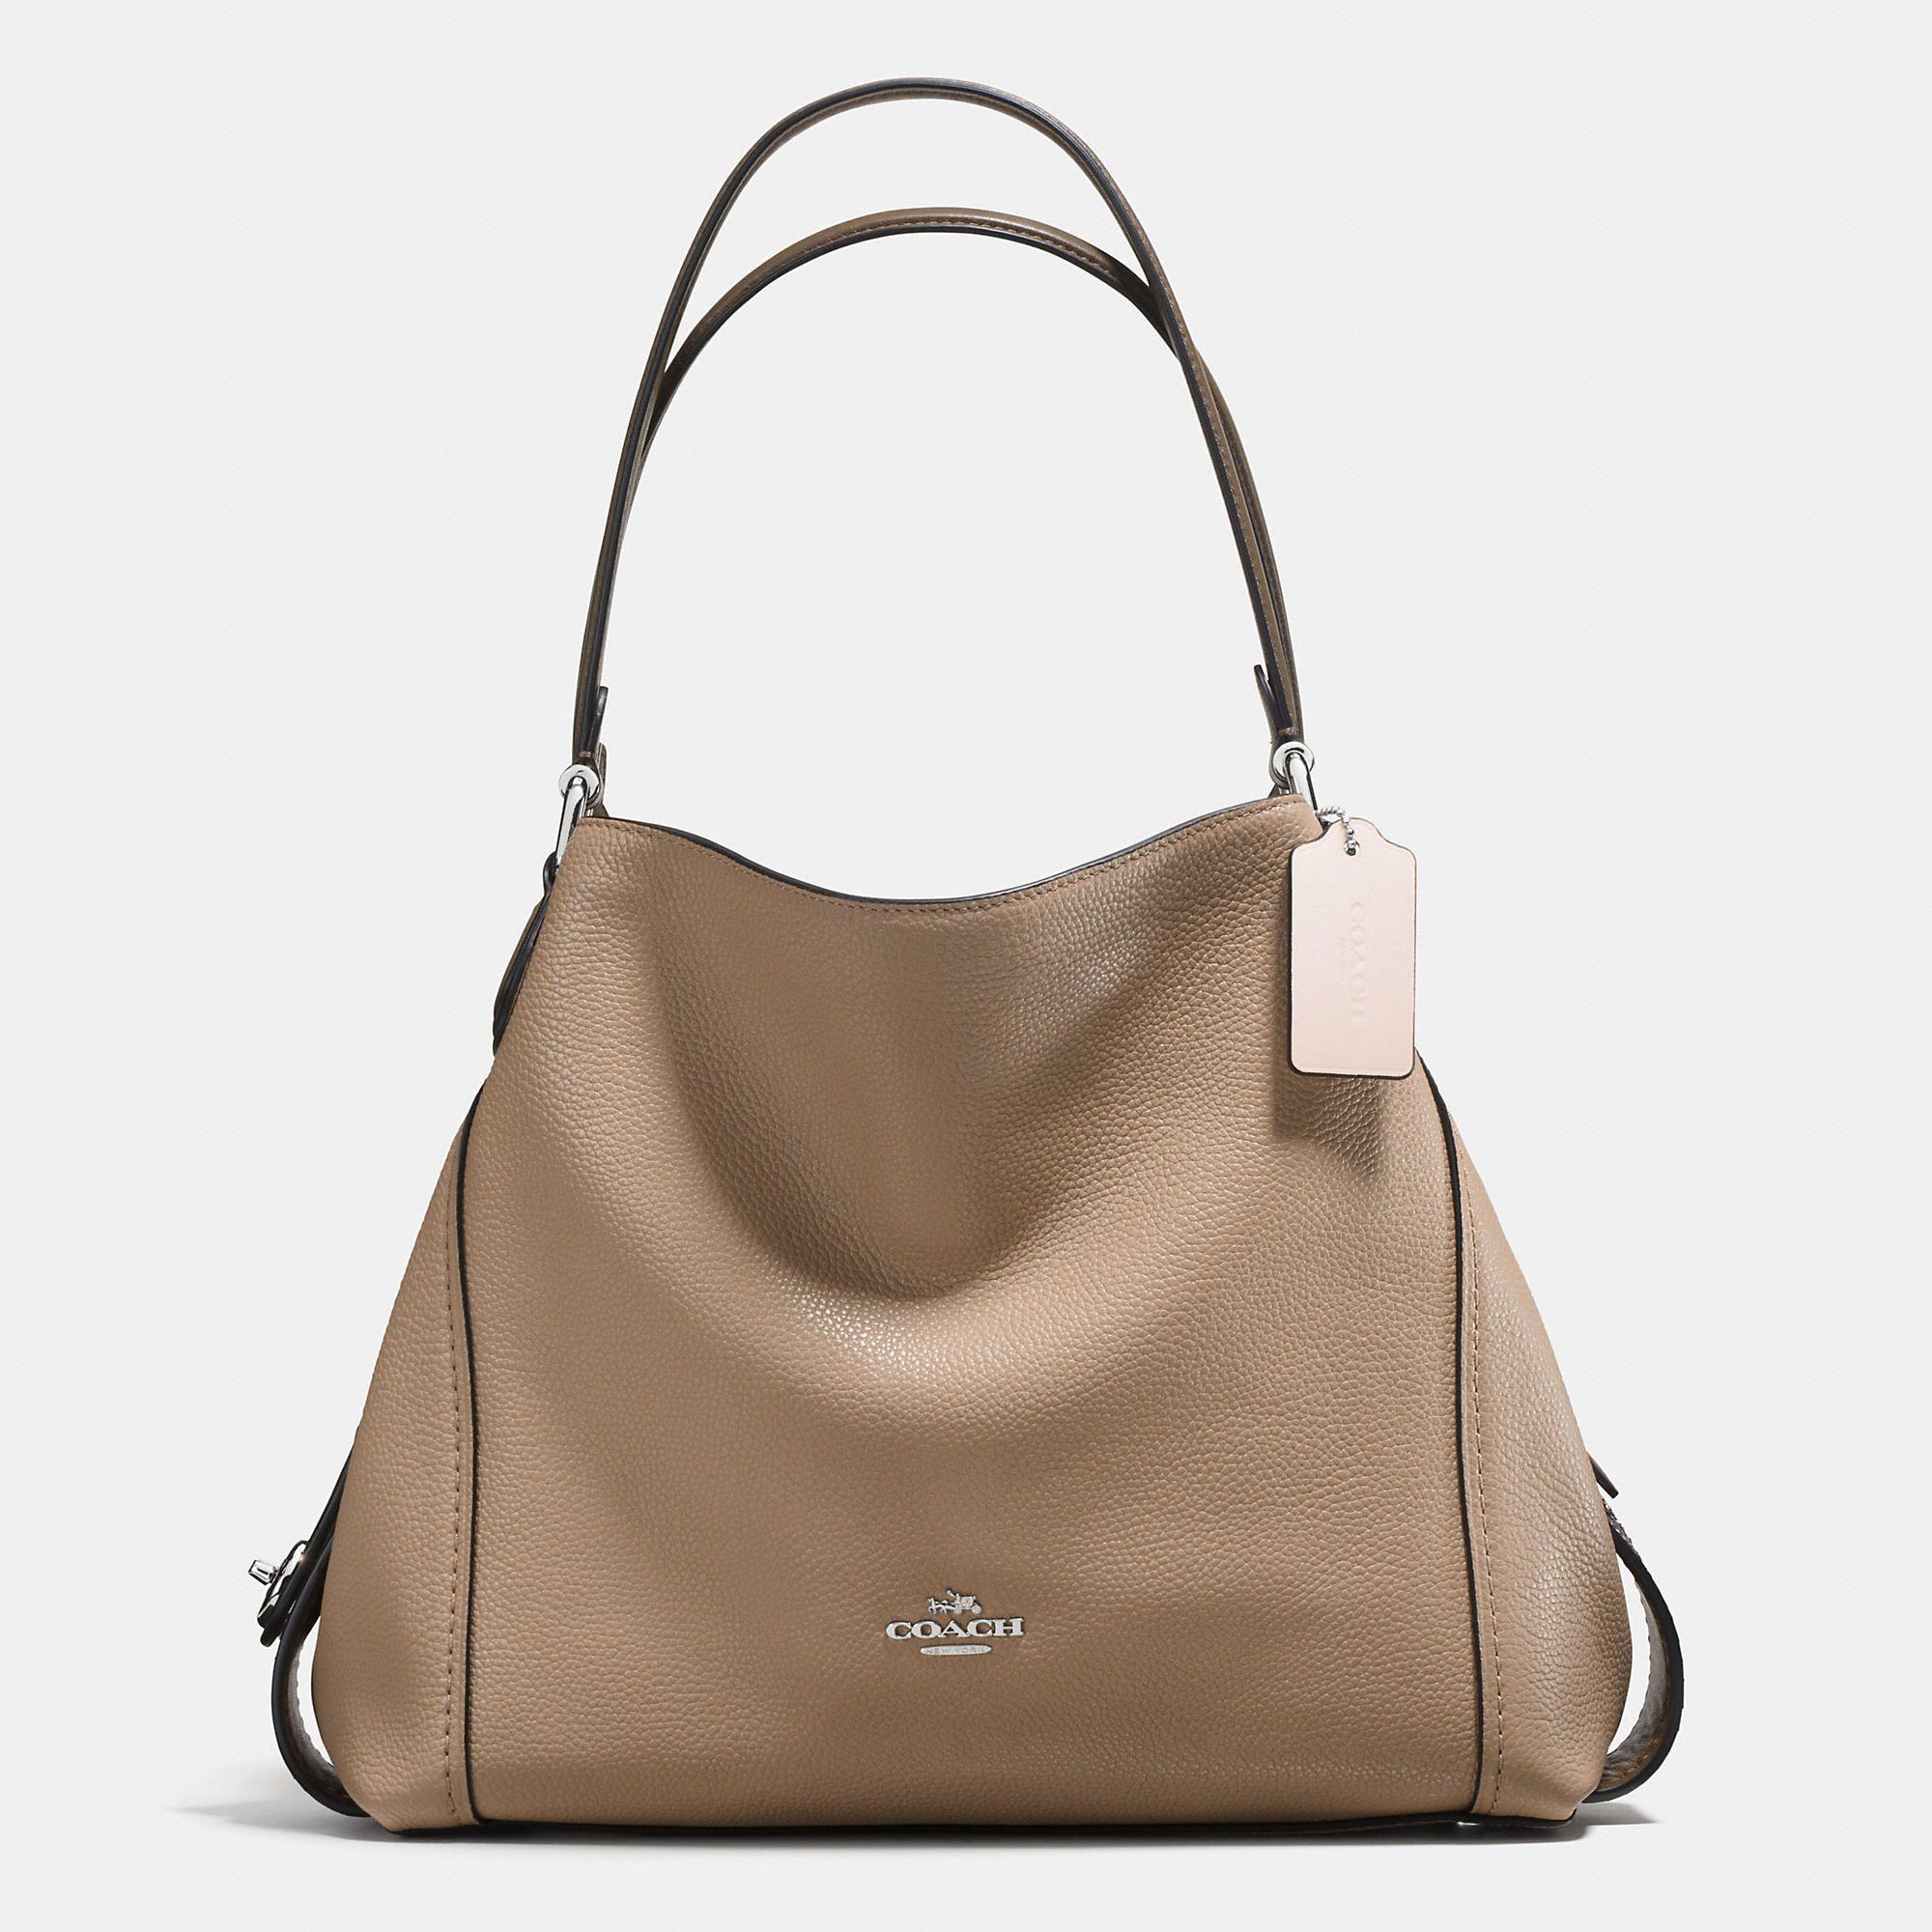 COACH: Colorblock Edie Shoulder Bag 31 In Mixed Materials